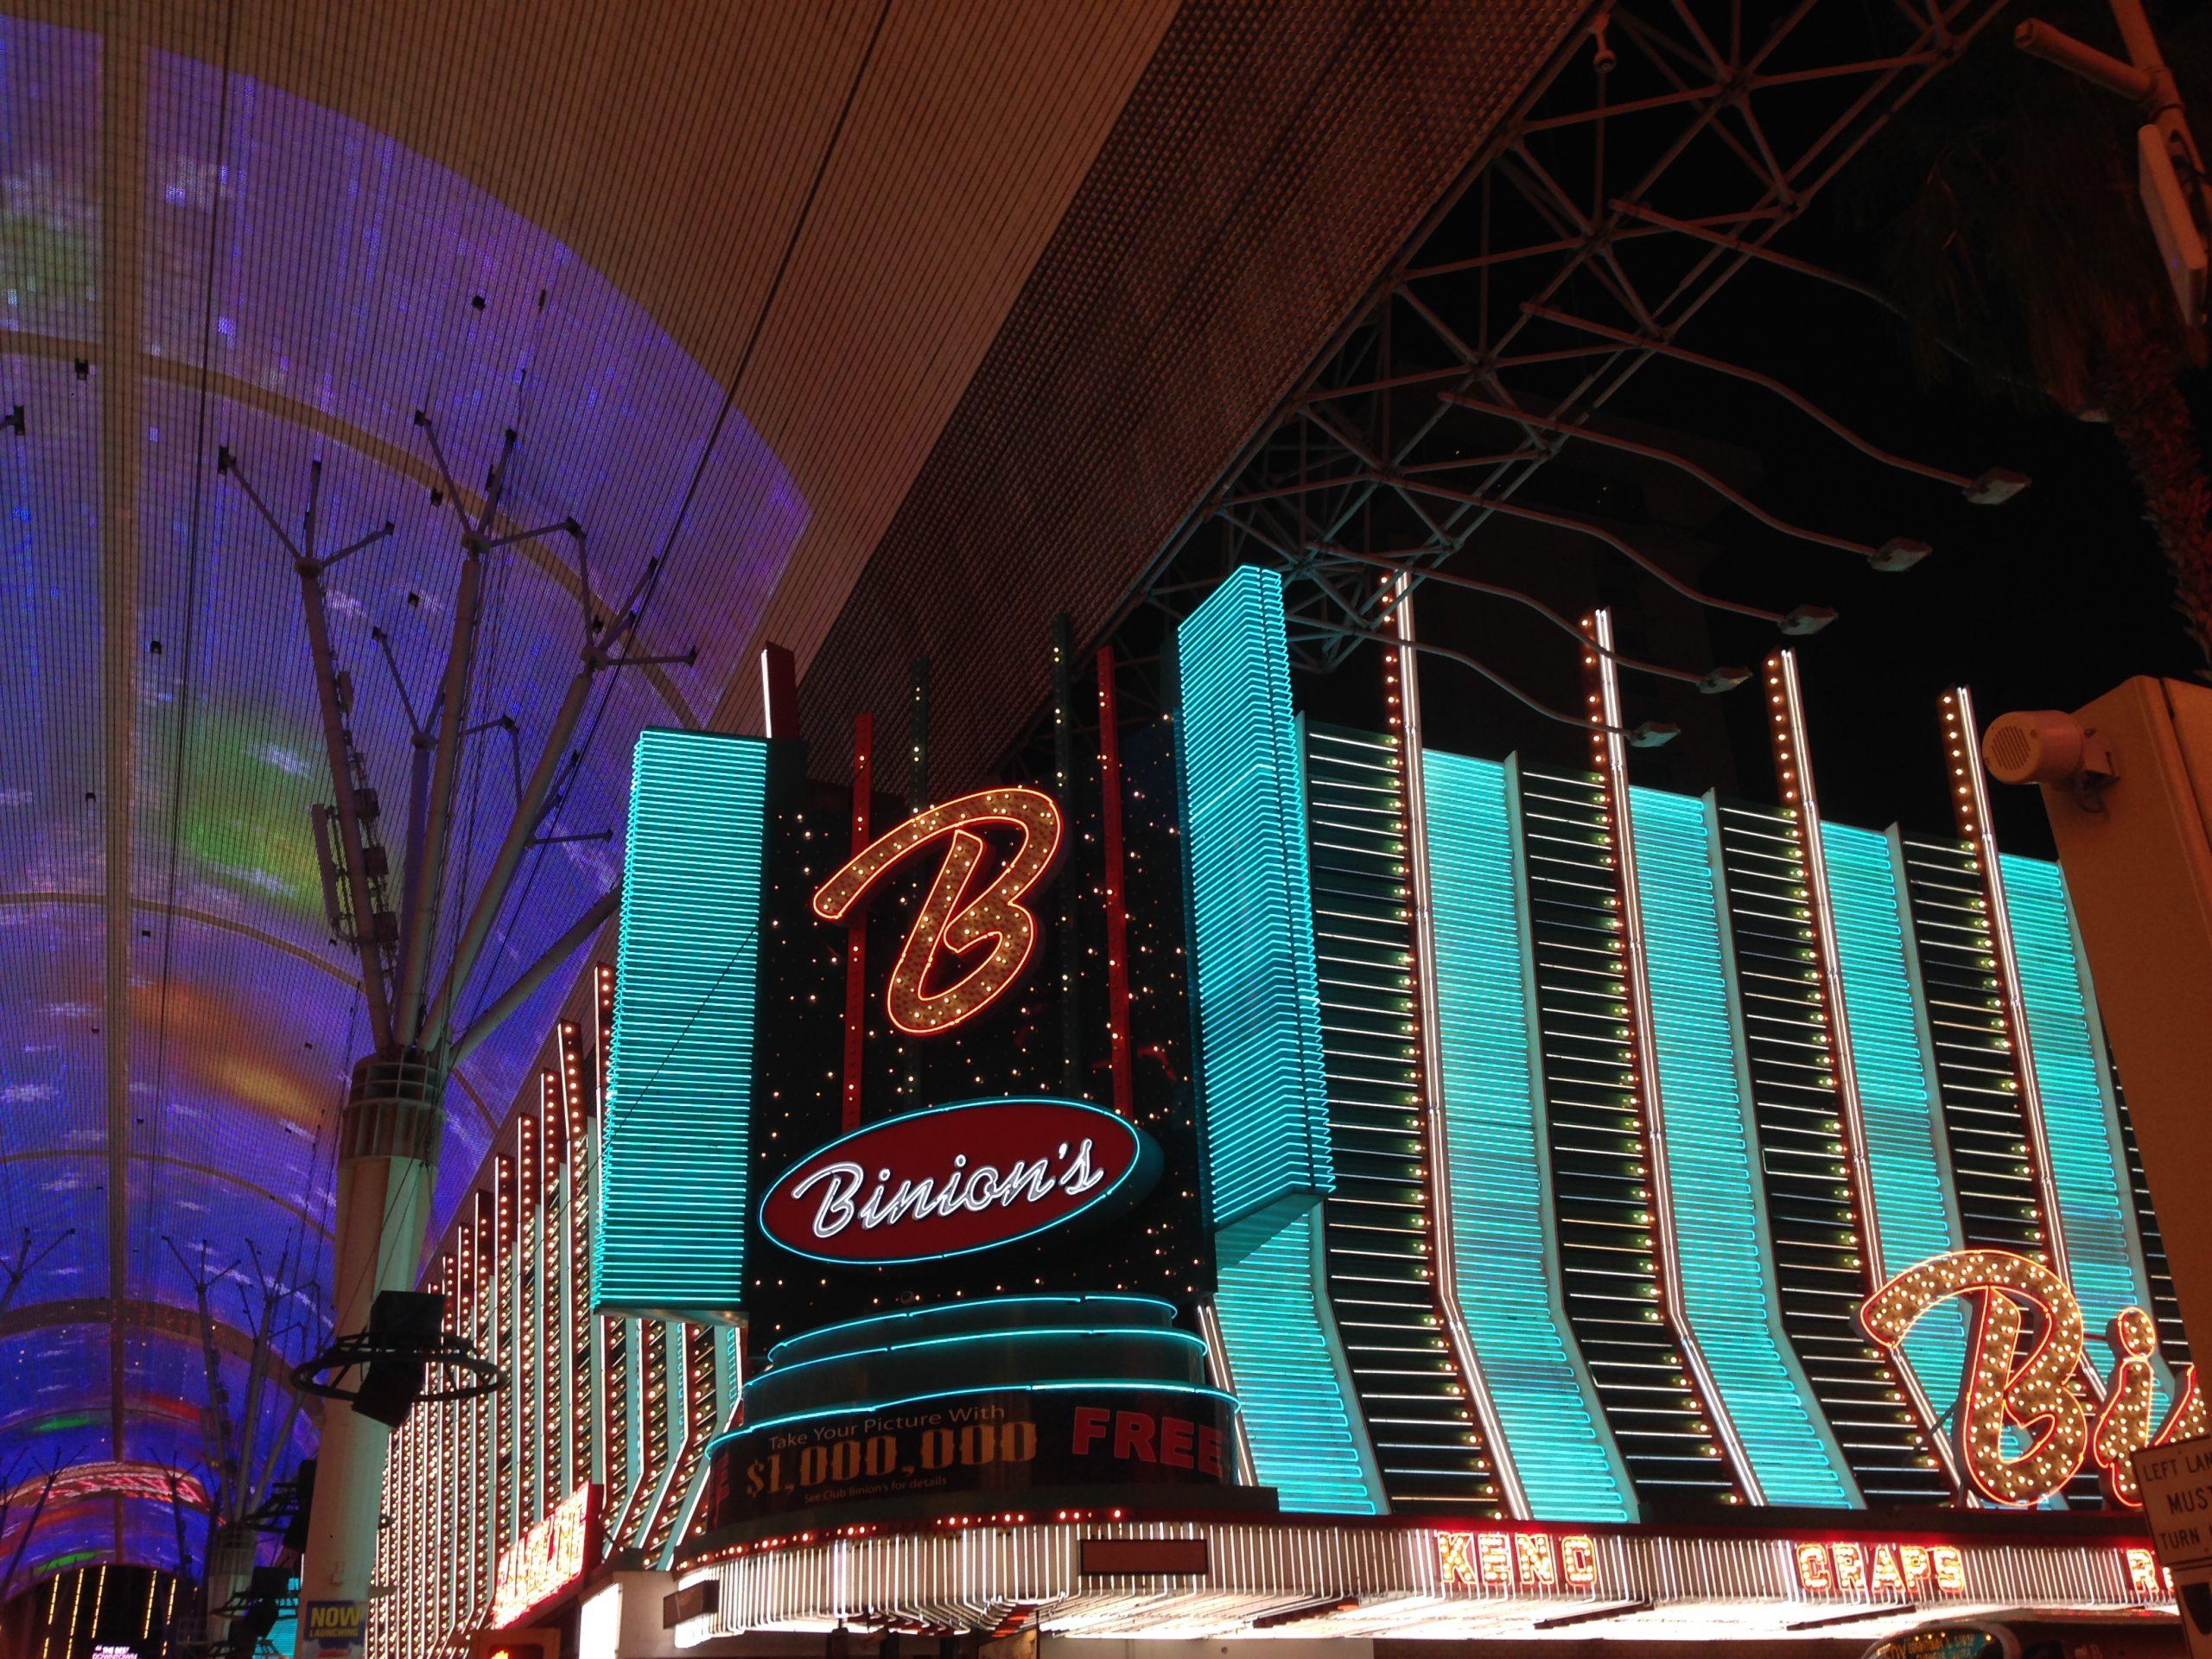 Binion's Casino 2018, Binion's Casino, Binion's Casino